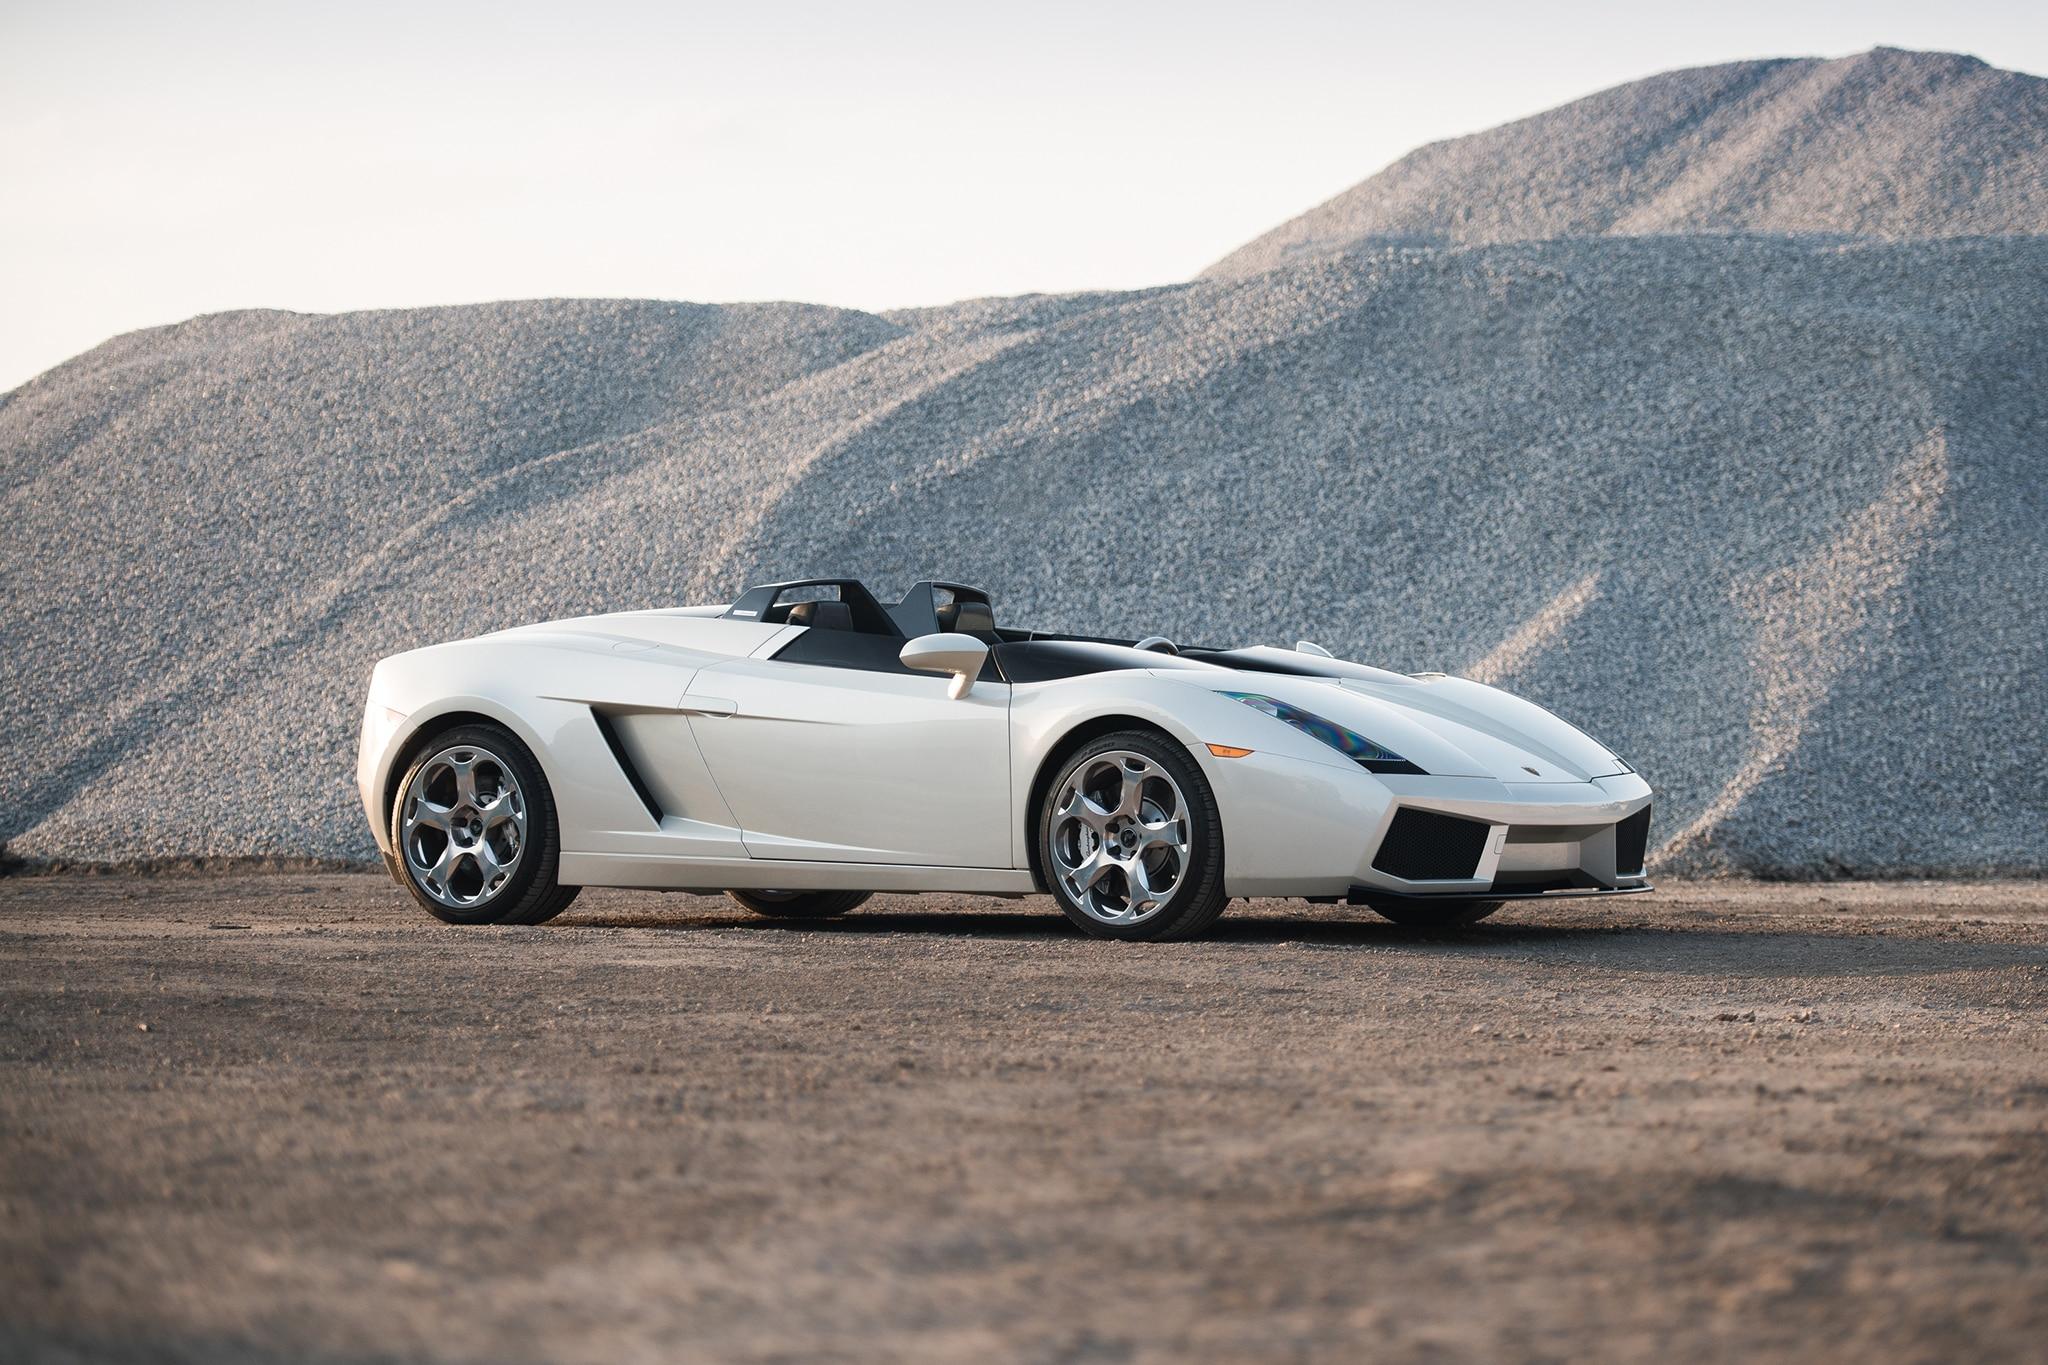 2006 Lamborghini Concept S RM Sothebys Front Three Quarters